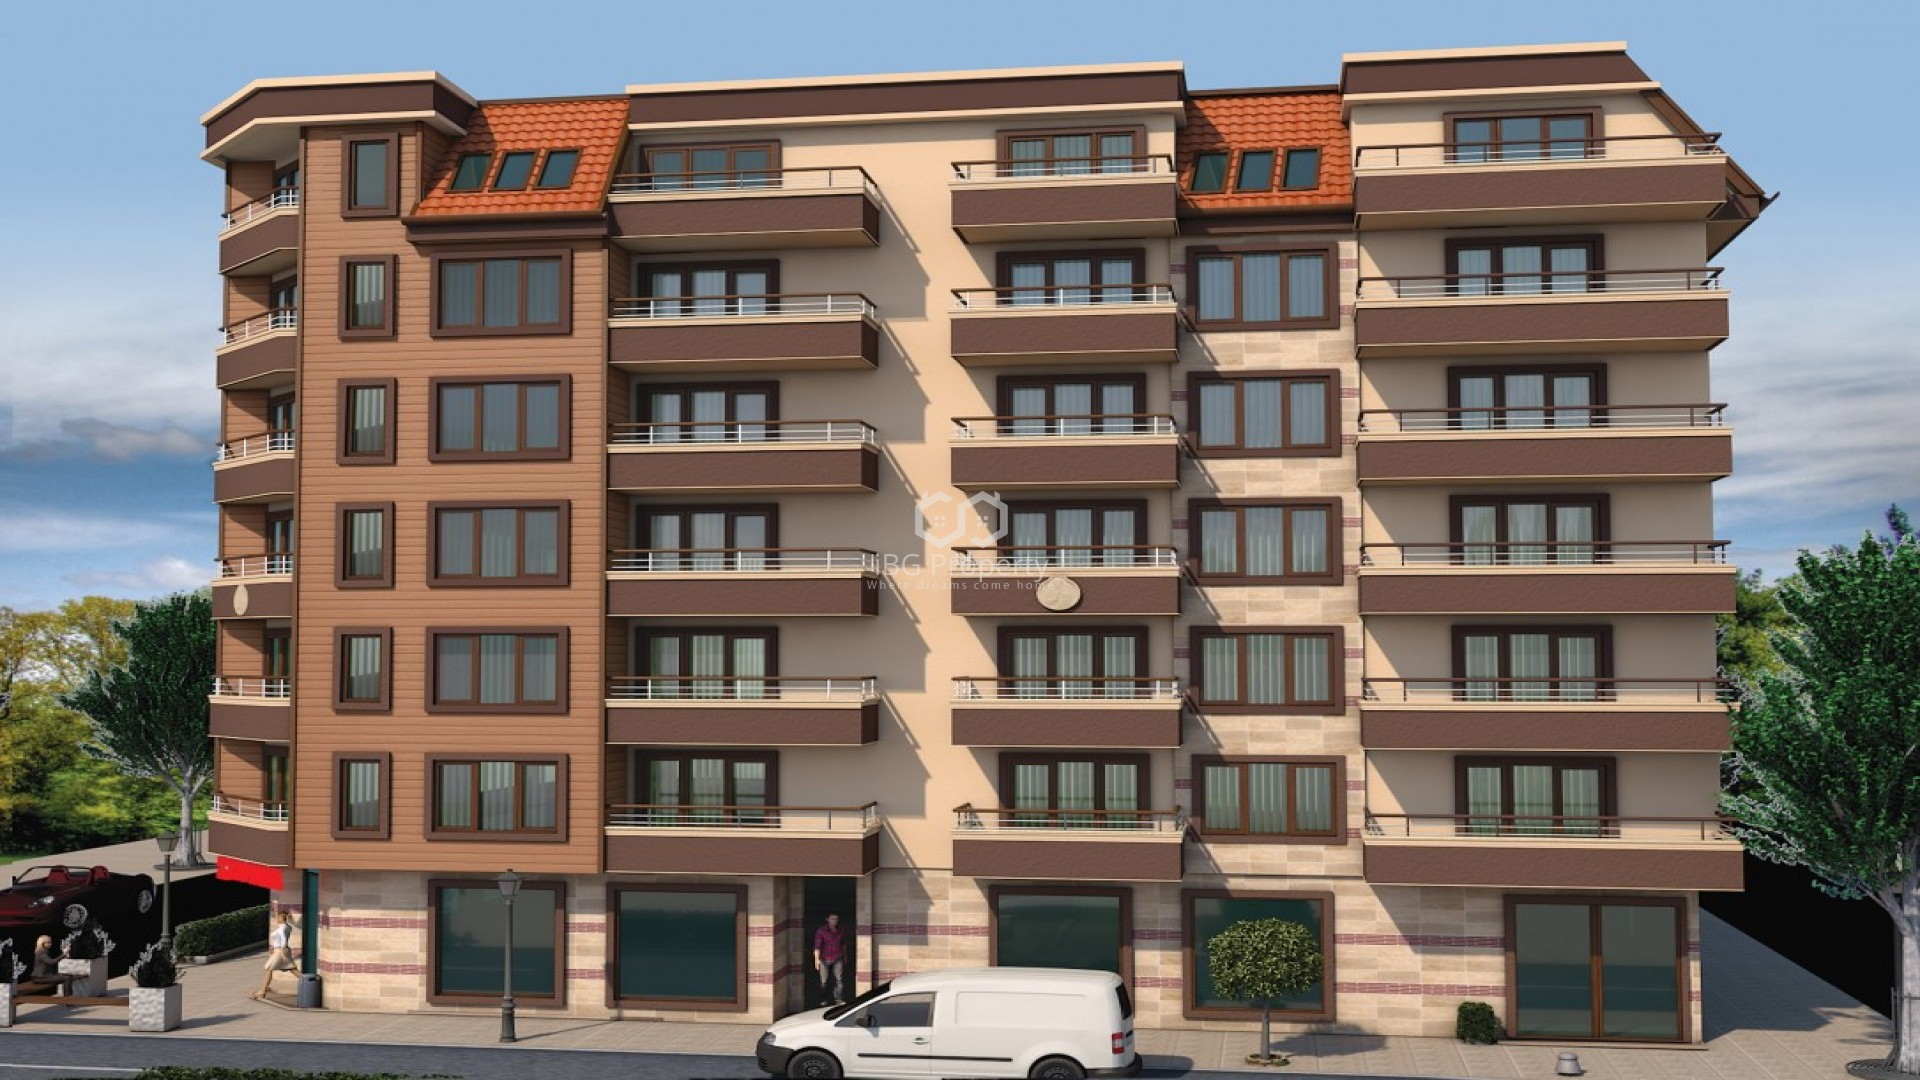 Tристаен апартамент Братя Миладинови Бургас  85 m2